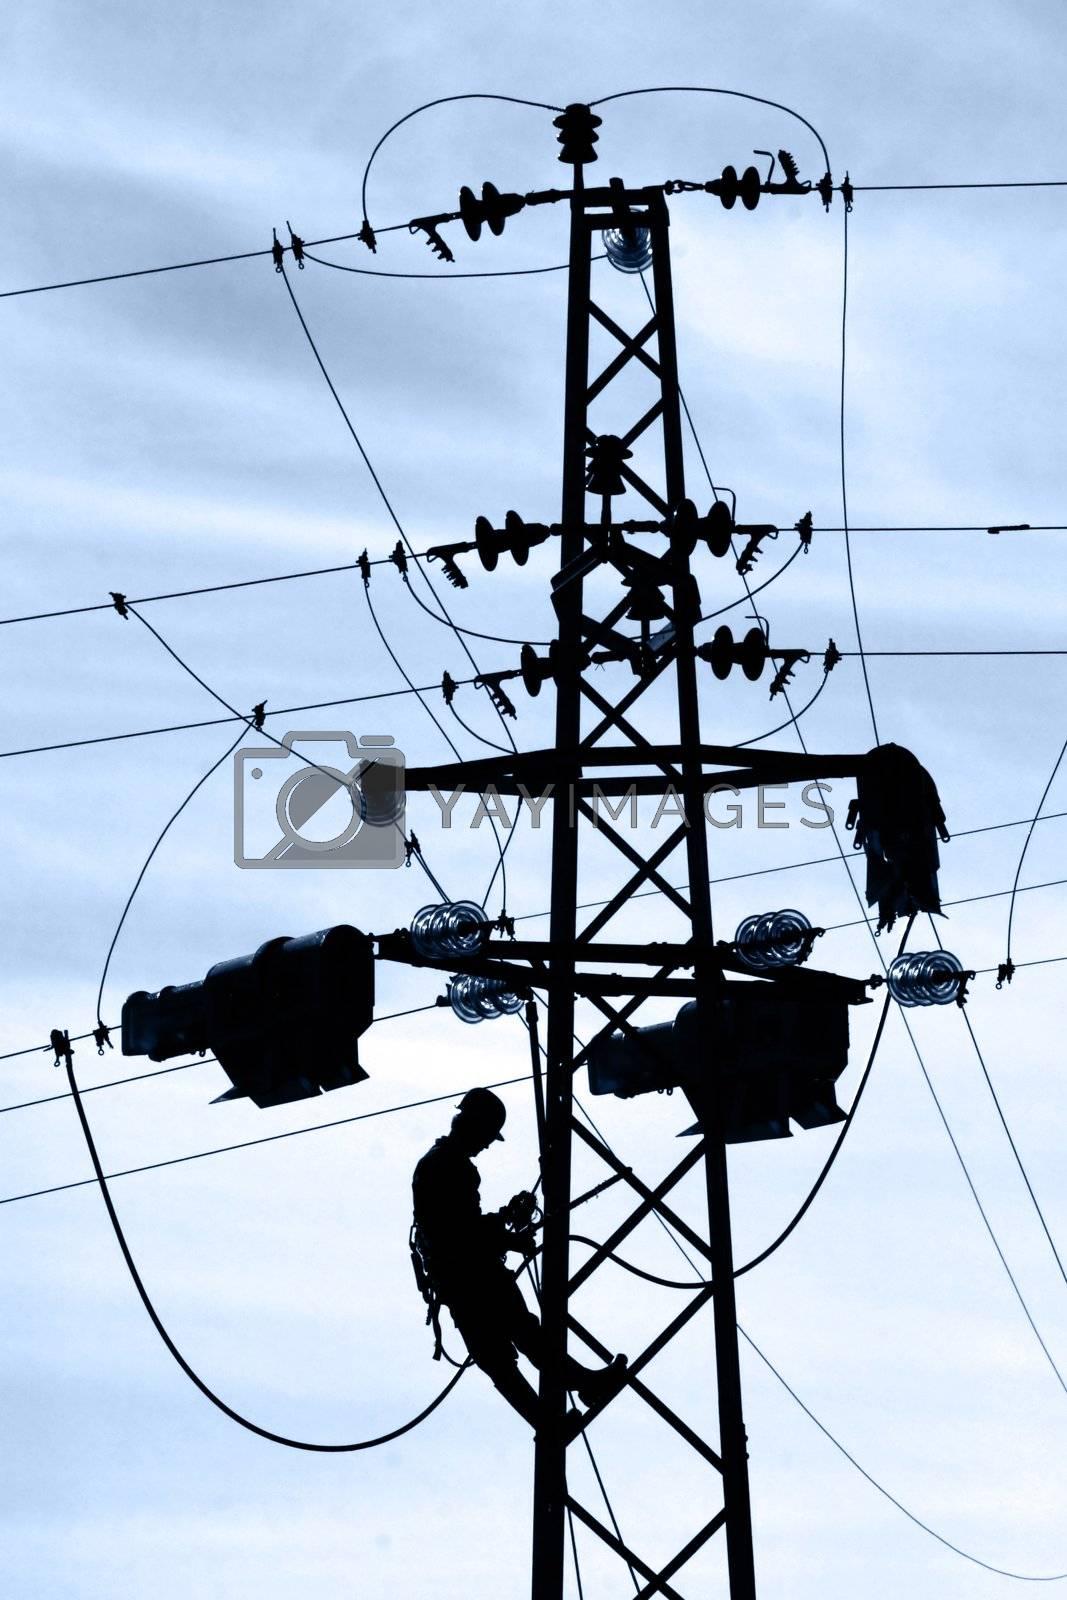 Powerline worker on service